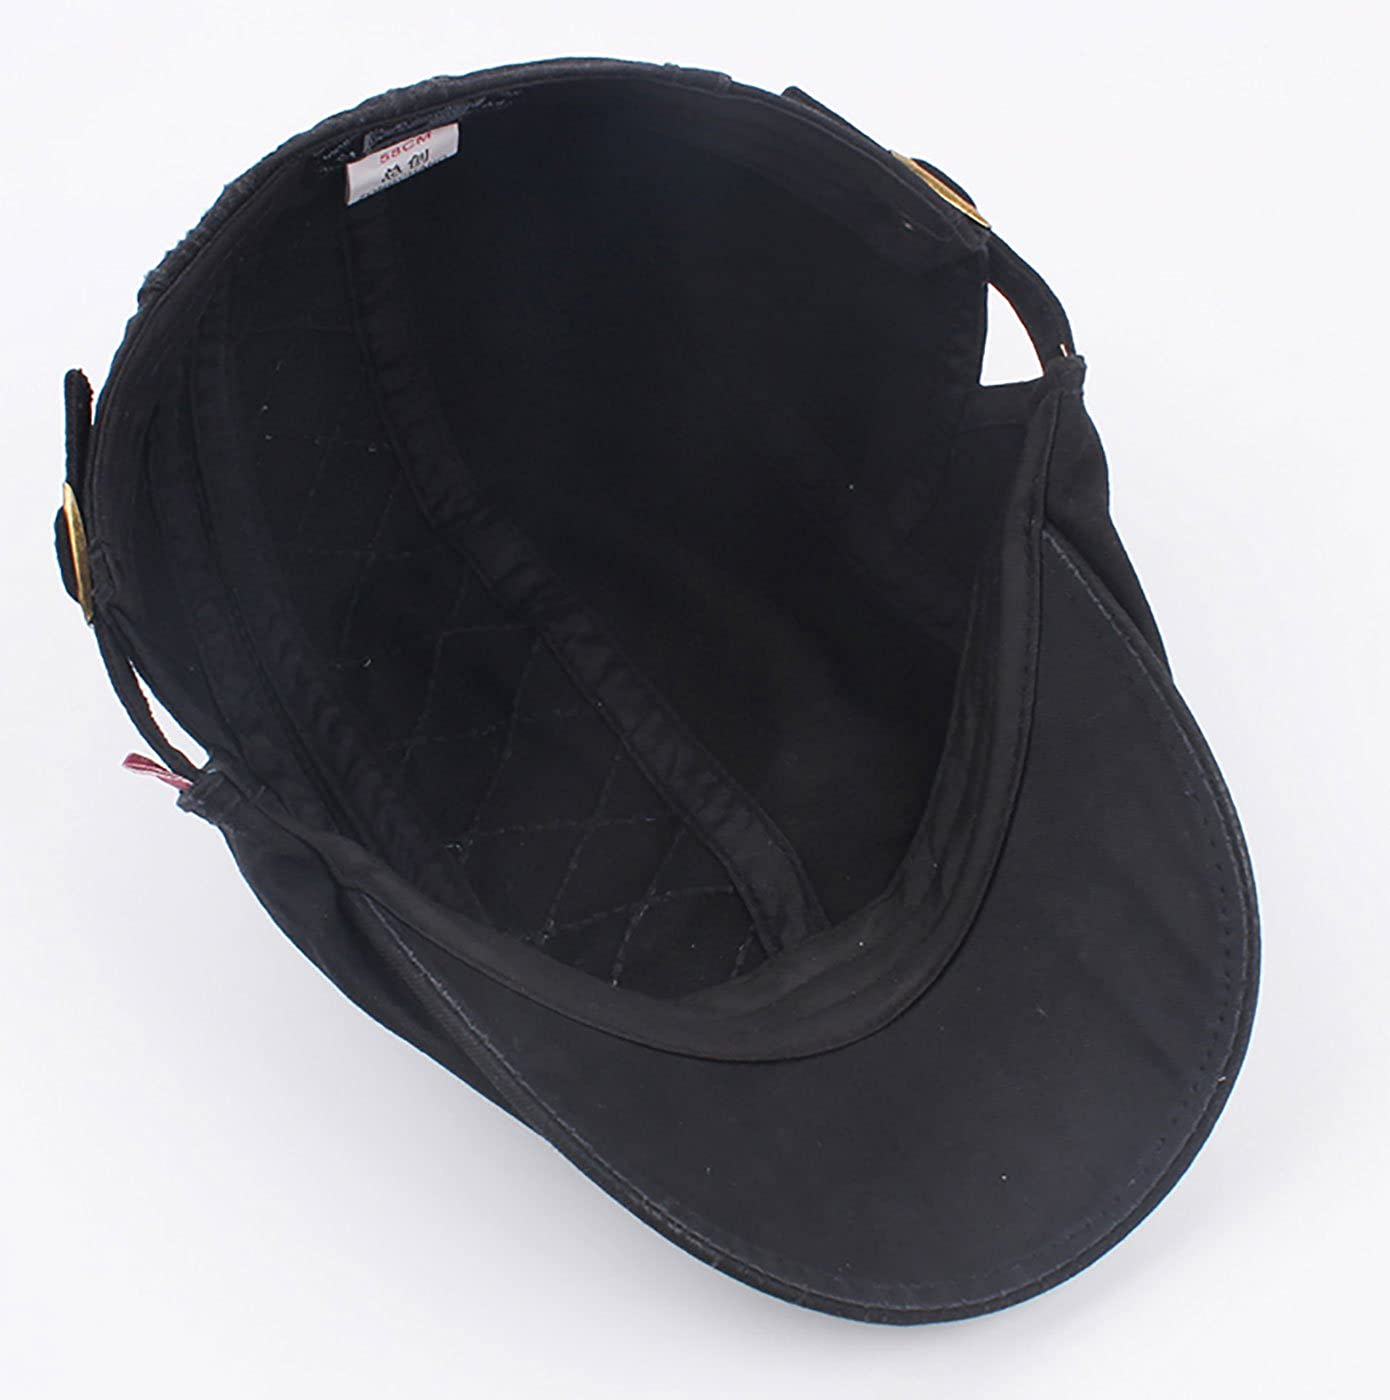 Visera Protectora Transparente Prueba de Sapicaduras Escudo de Protecci/ón de Cara Antivaho Ajustable Protector Facial Completa para Hombre Mujer Panegy